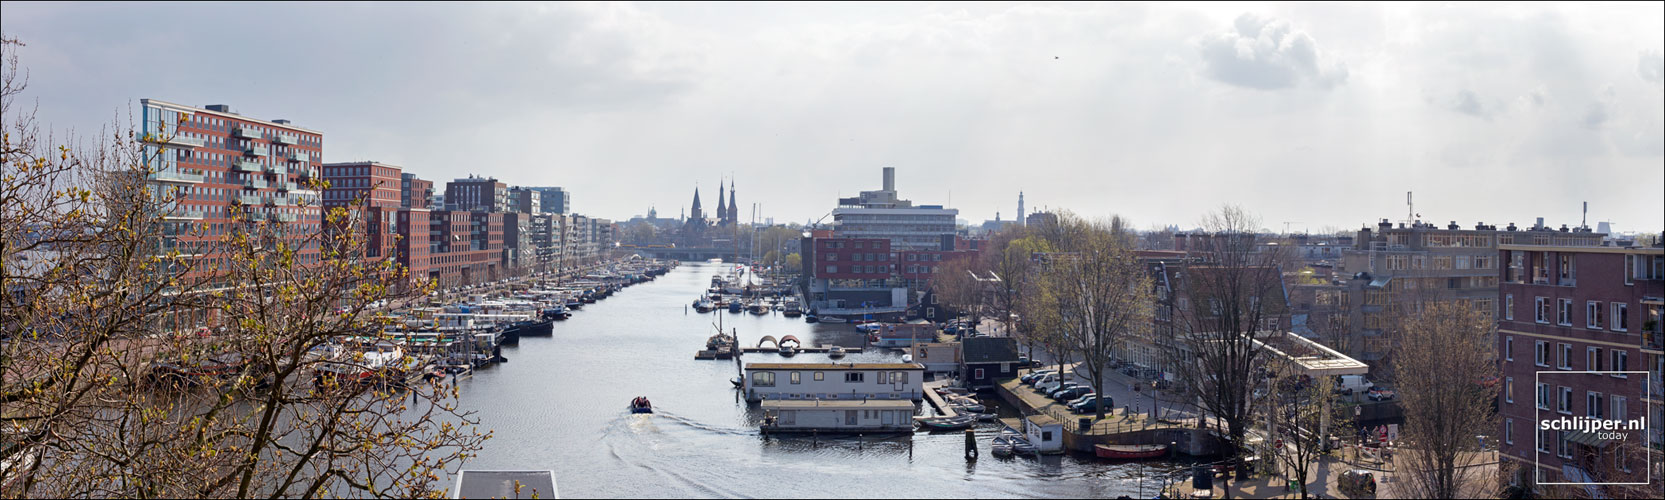 Nederland, Amsterdam, 25 maart 2014